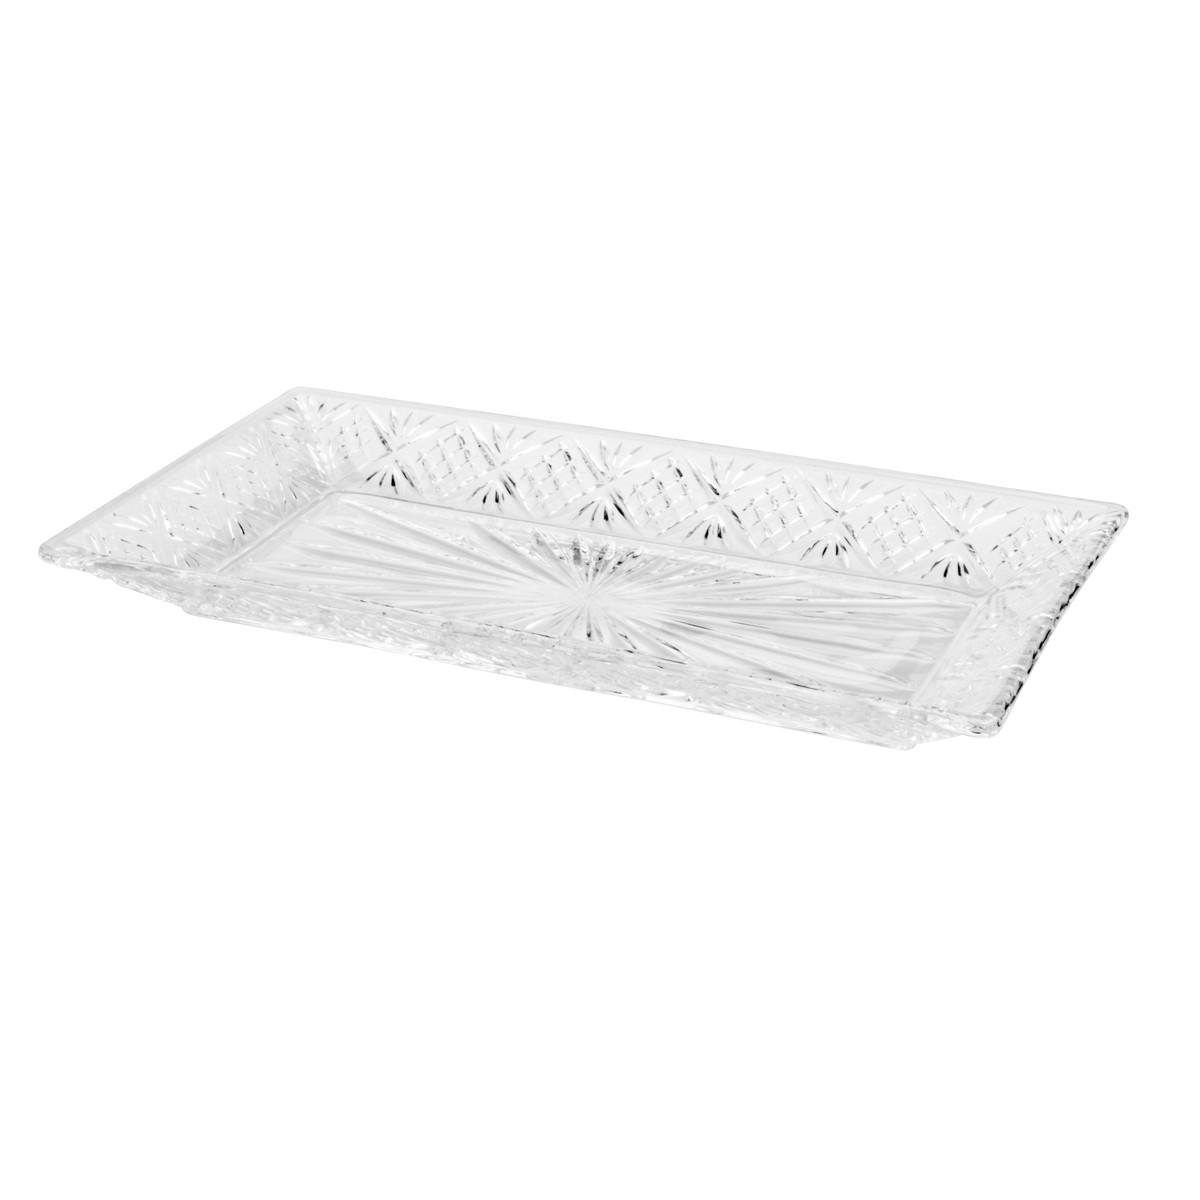 Prato de Cristal Dublin 30 x 15,5 cm